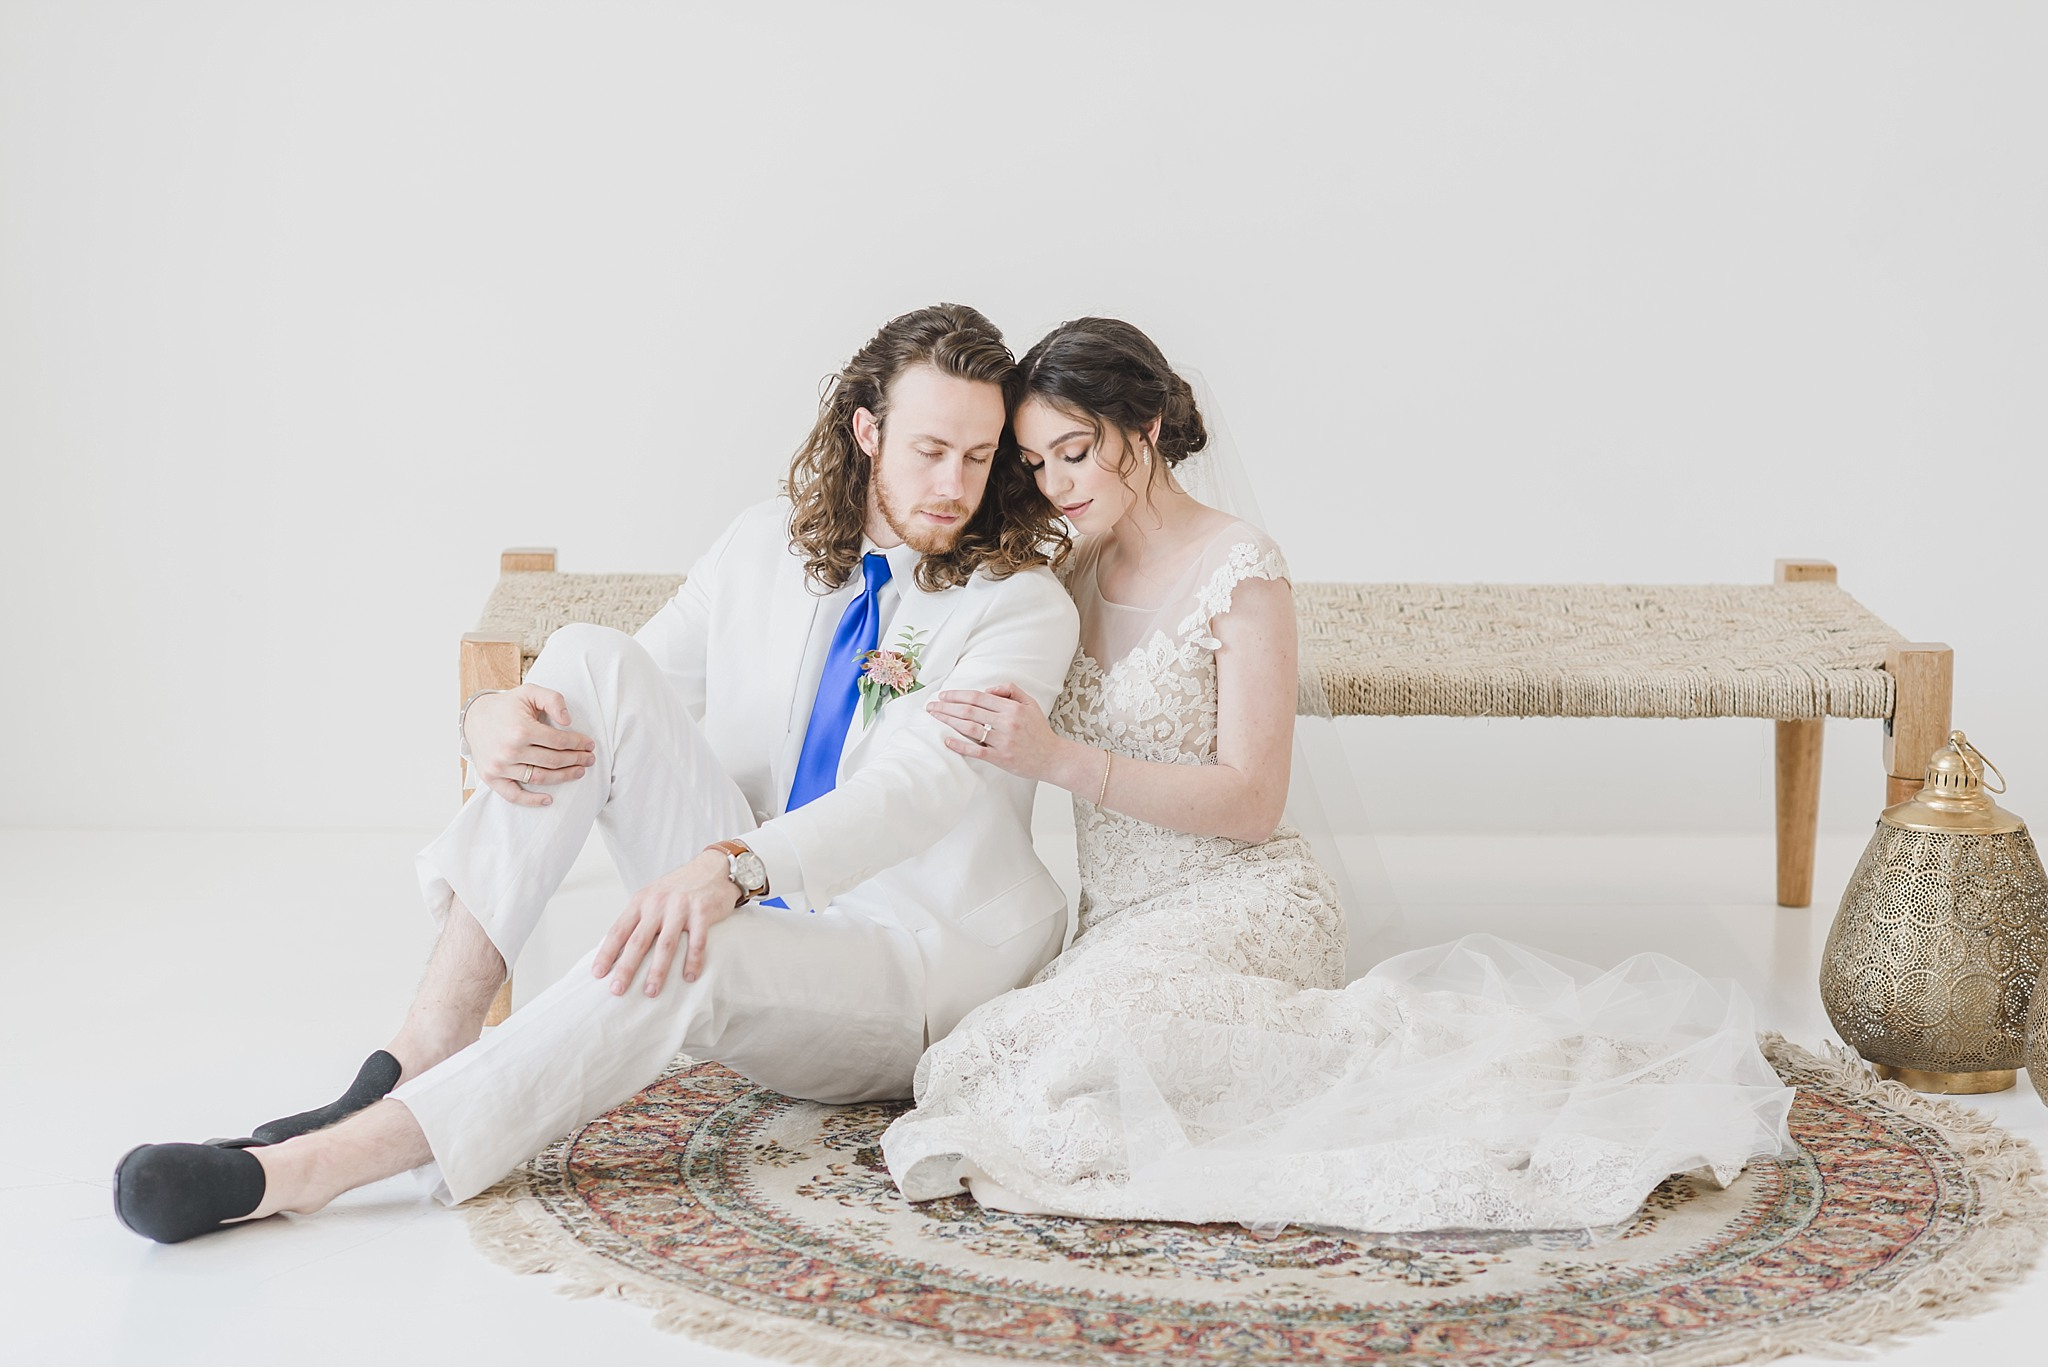 Beautiful Light and Airy Styled Greek Wedding Supply Manheim PA Wedding photography photo_1894.jpg